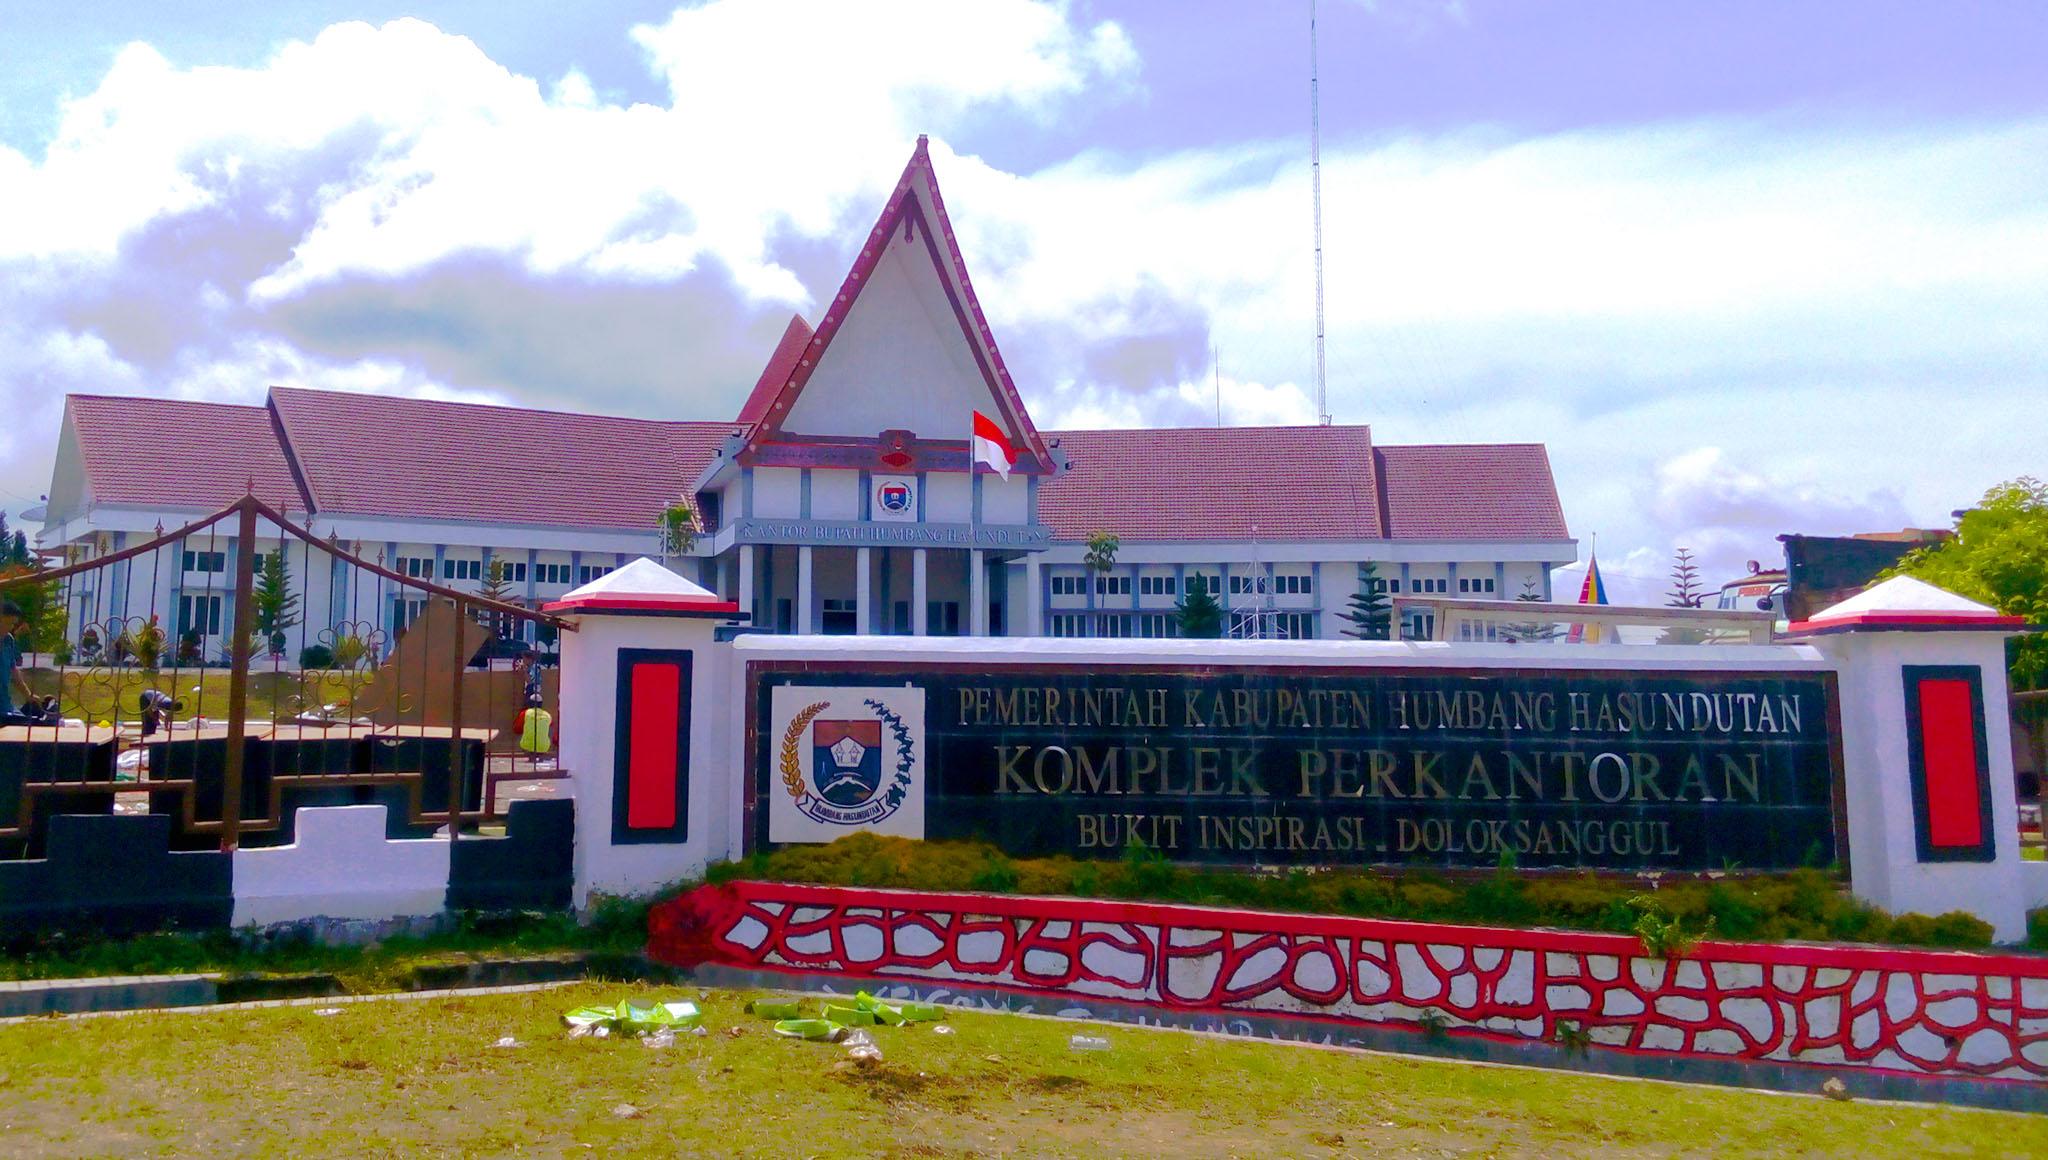 Kabupaten Humbang Hasundutan Wikipedia Bahasa Indonesia Ensiklopedia Bebas